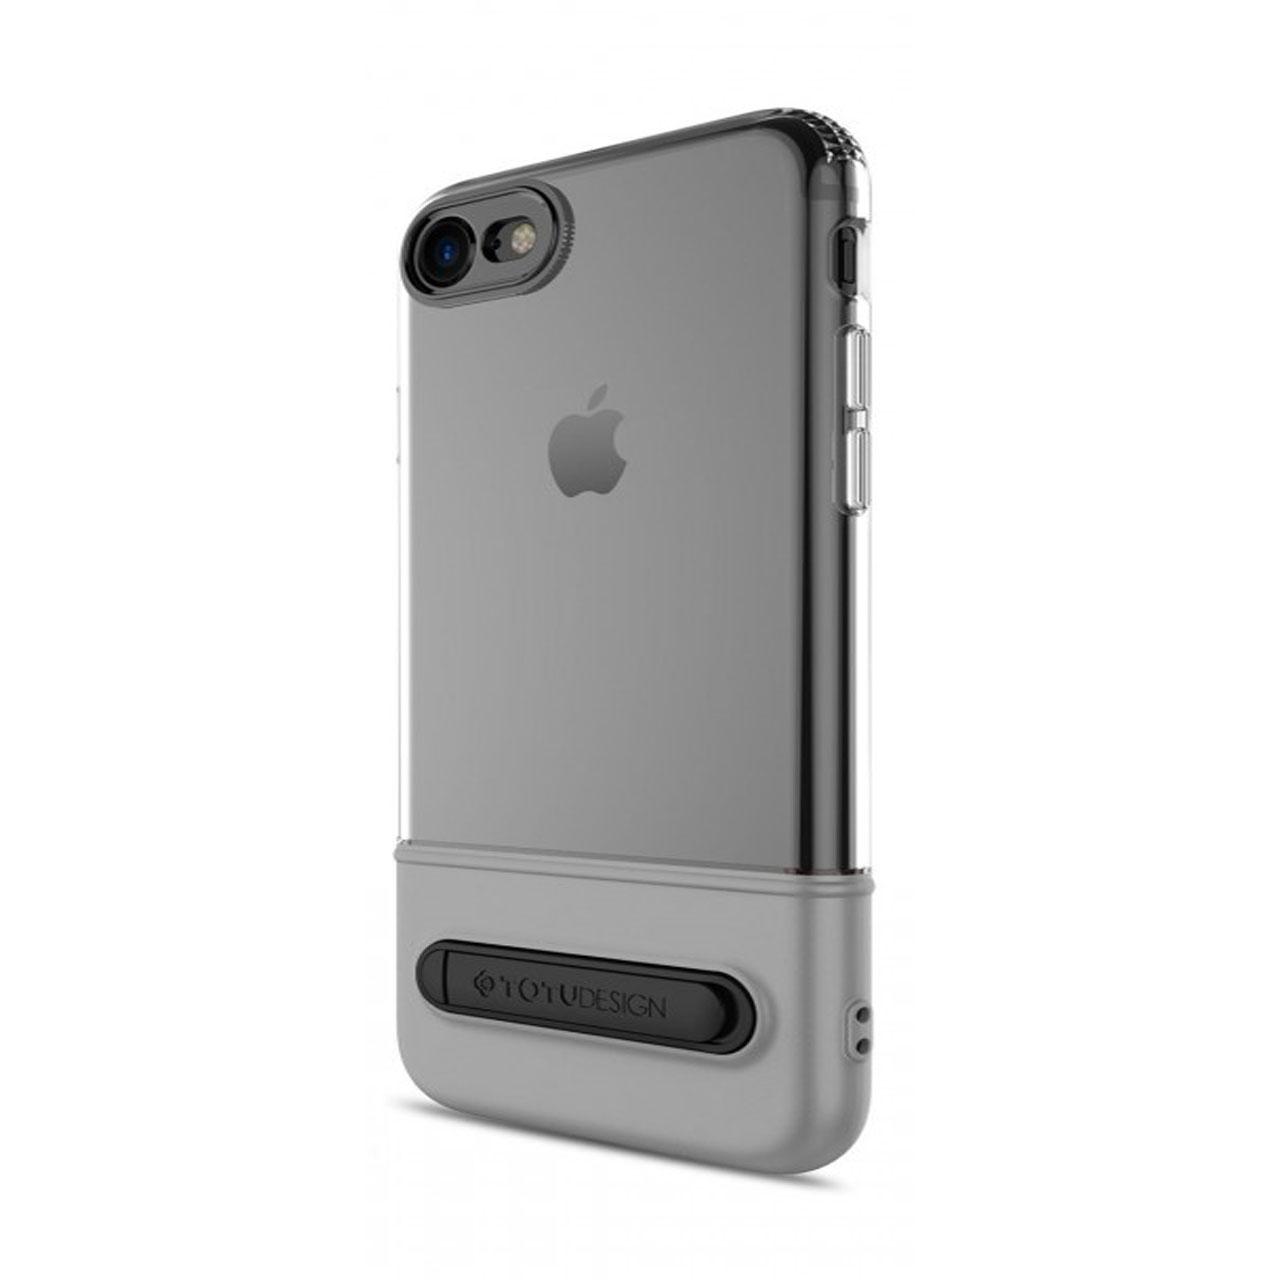 کاور توتو مدل TTمناسب برای گوشی موبایل اپل iphone7 / 8